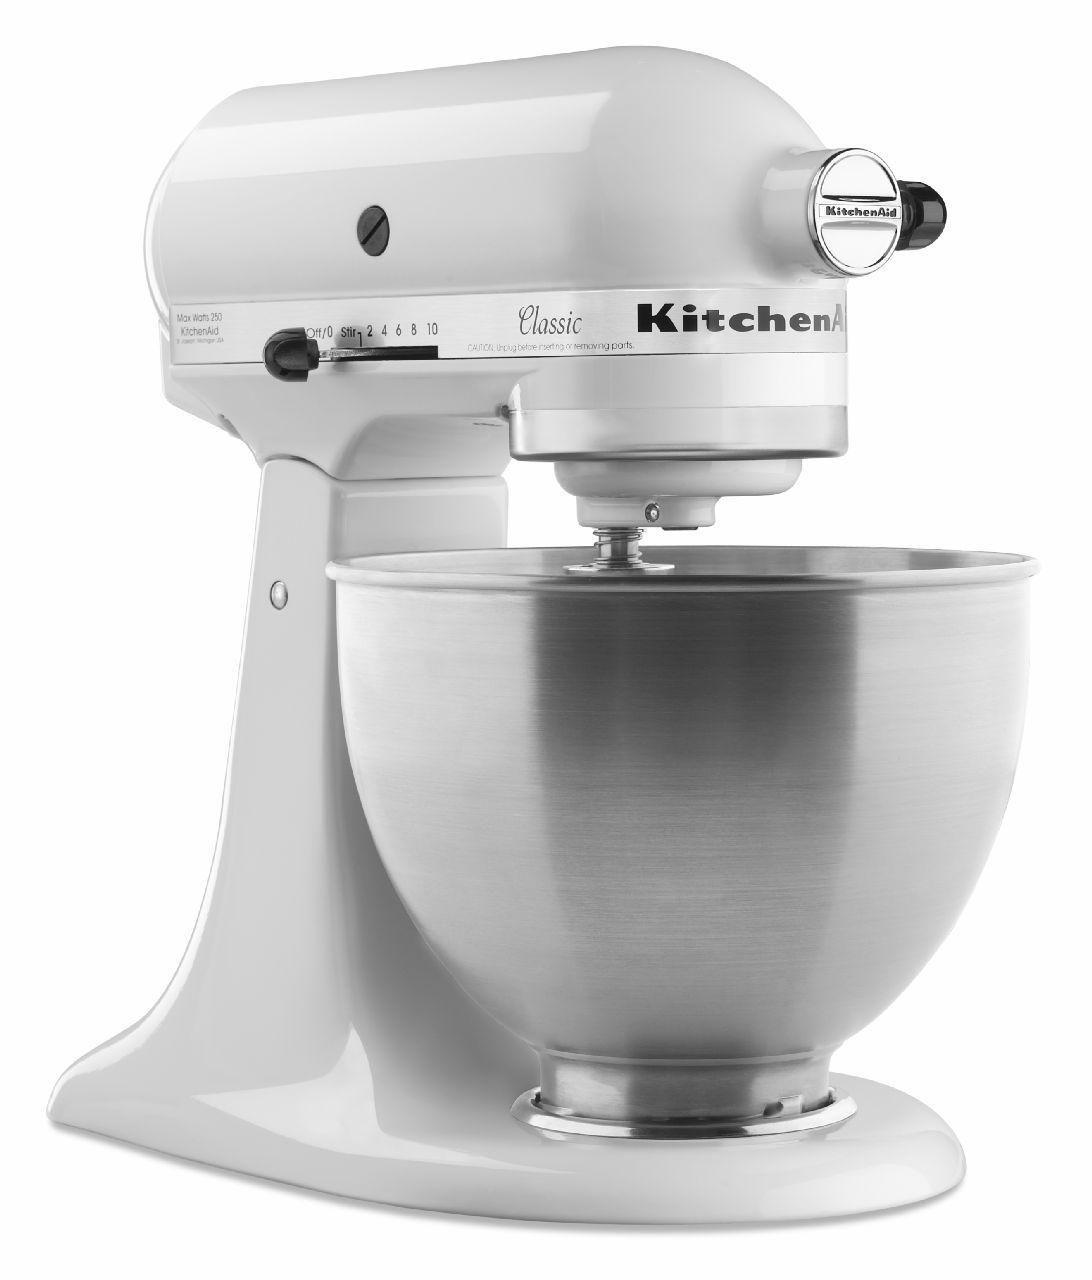 KitchenAid® Classic Series 4.5 Quart Tilt Head Stand Mixer | Walmart Canada